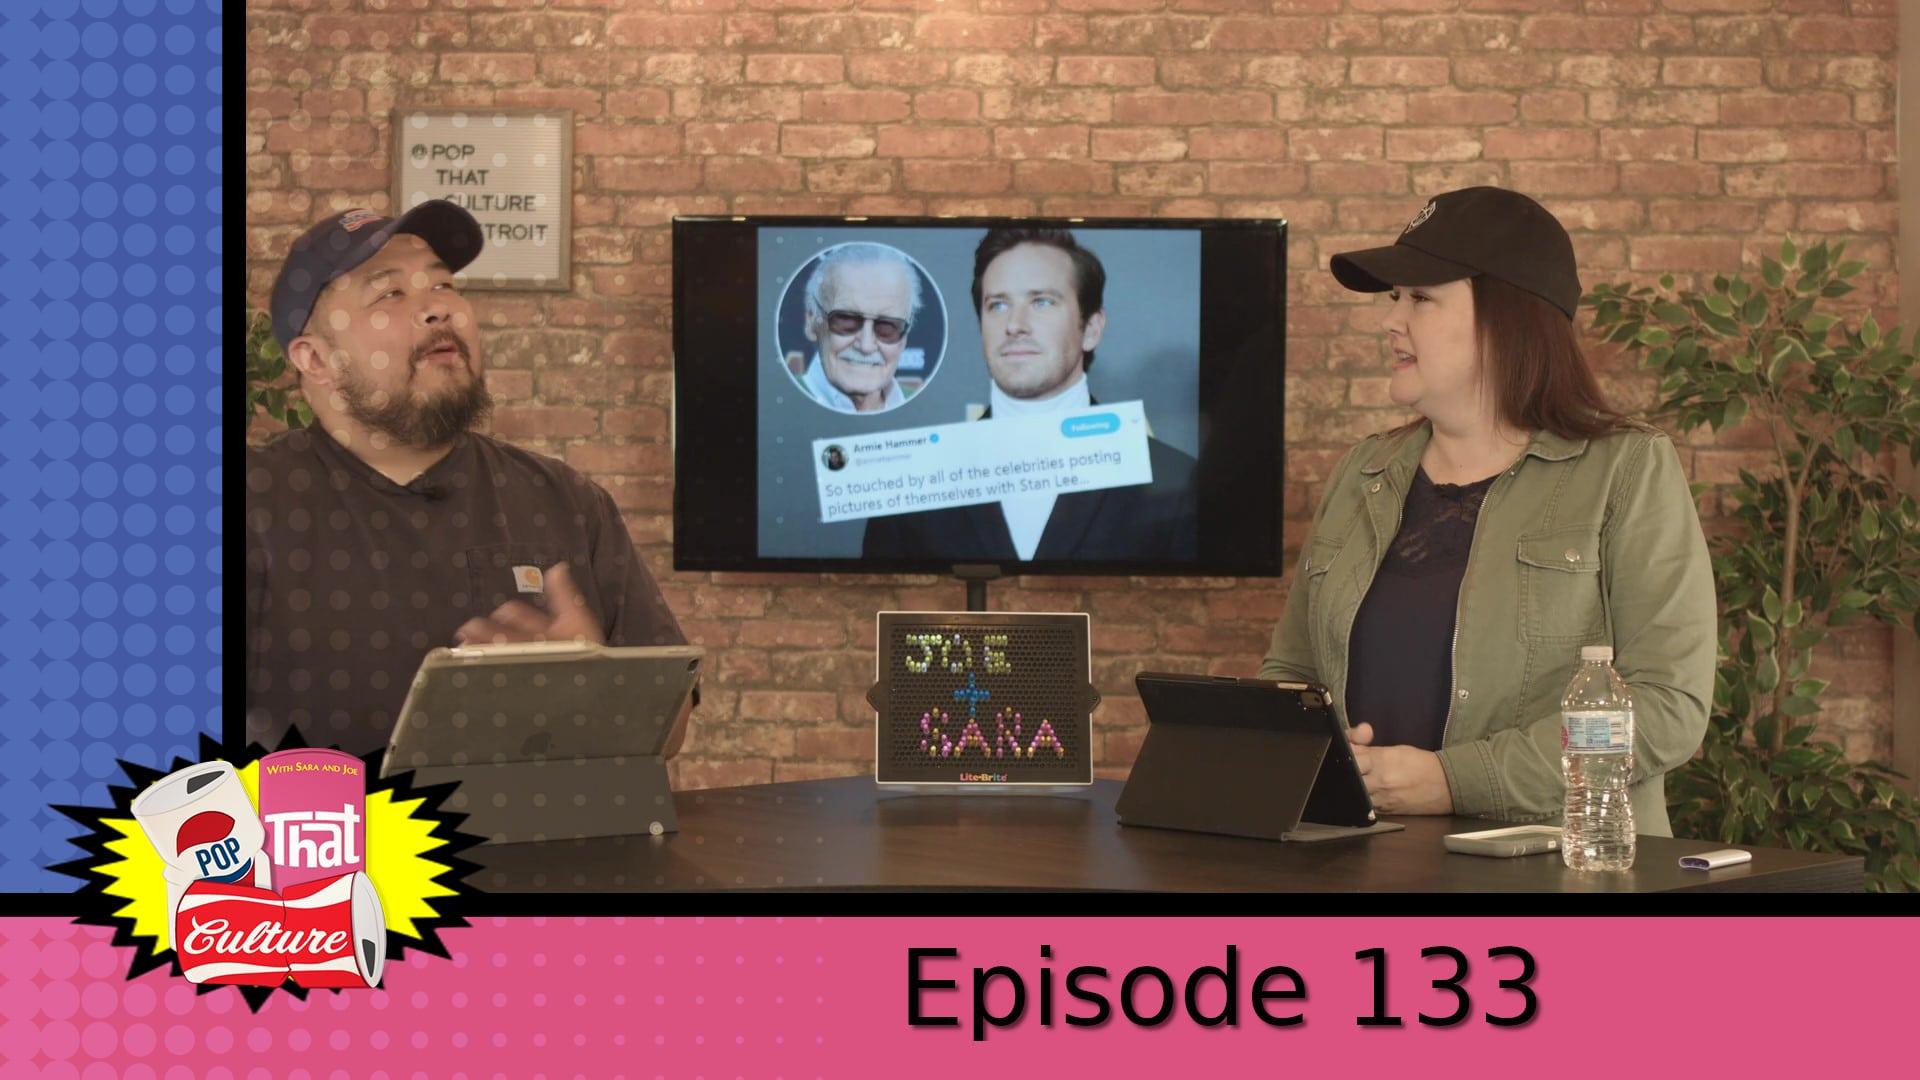 Pop That Culture - Episode 133